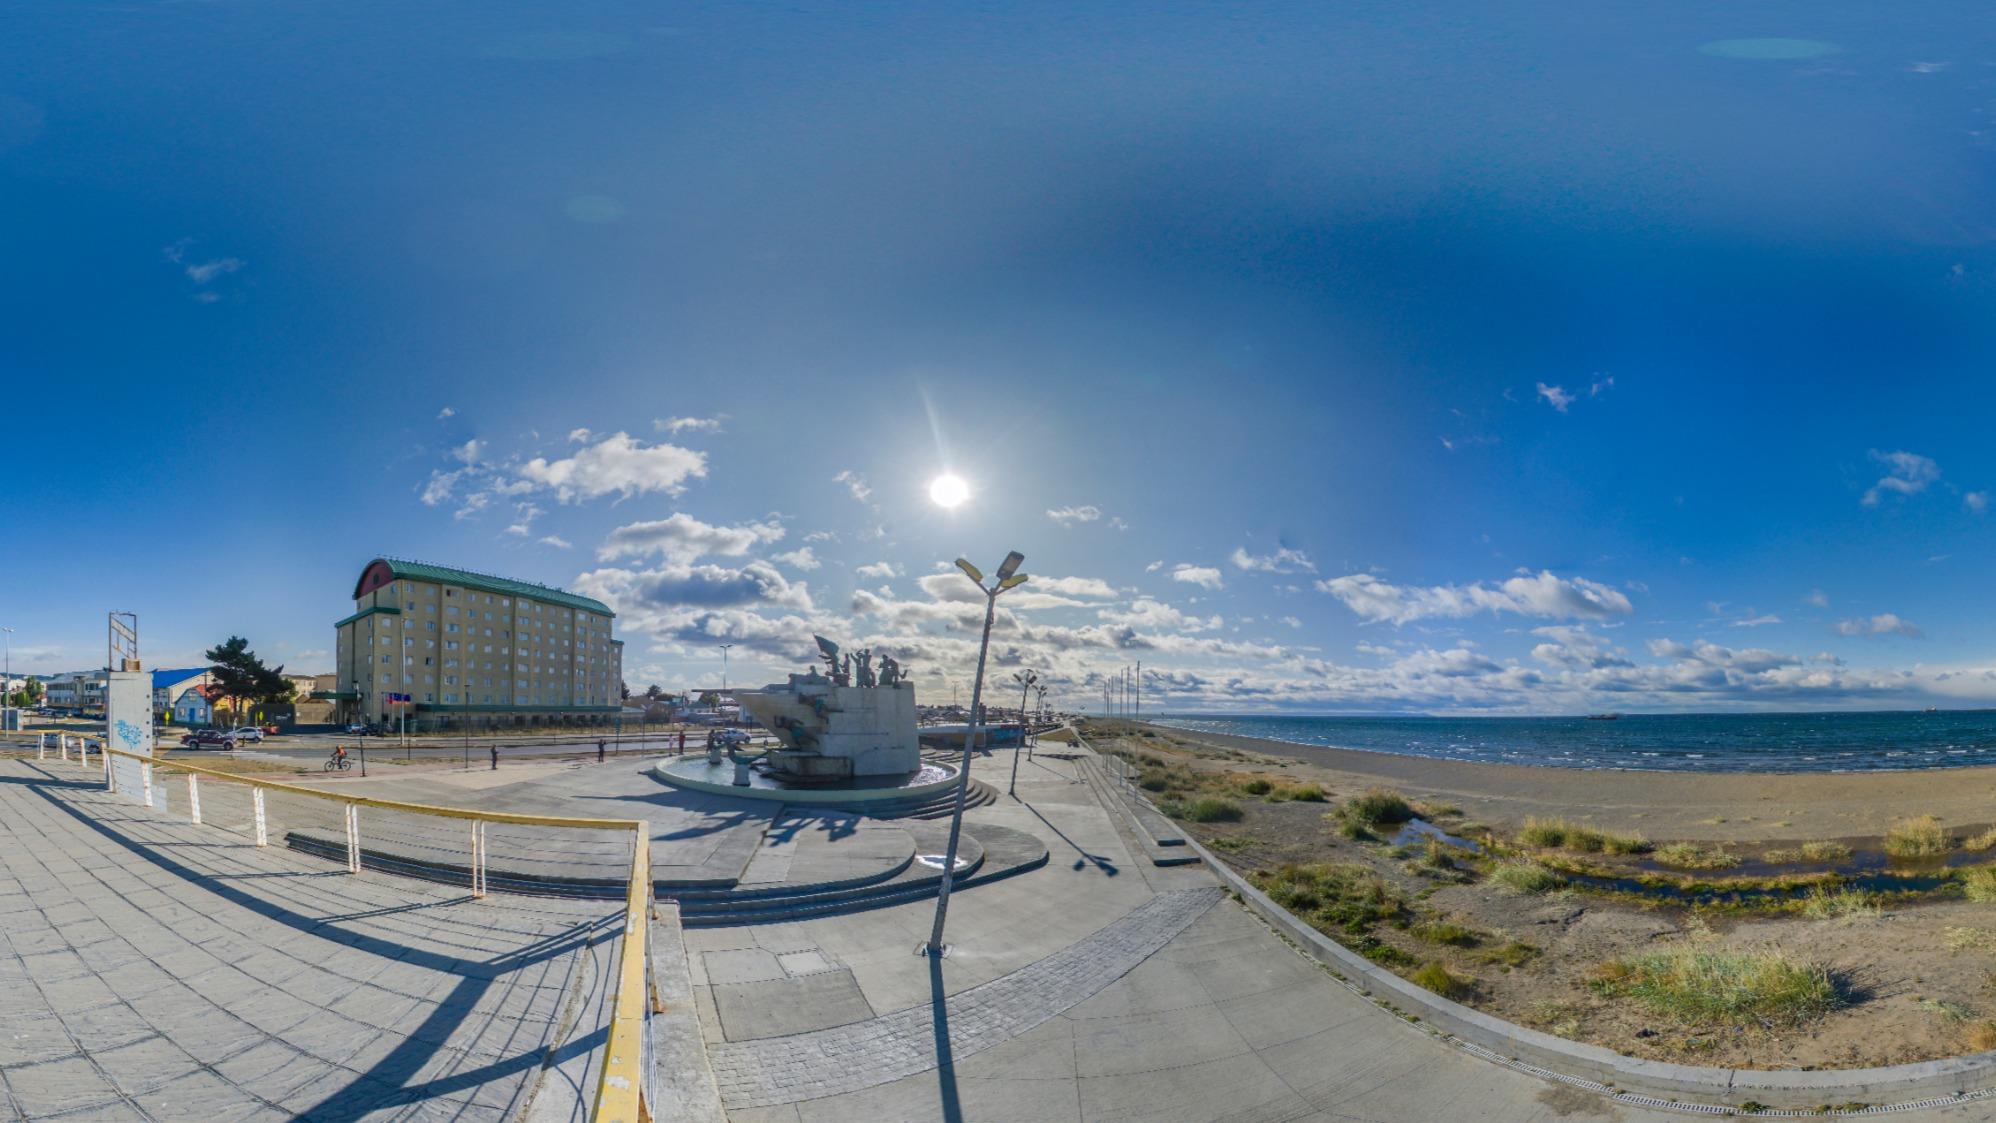 Monumento Tripulantes Goleta Ancud Punta Arenas